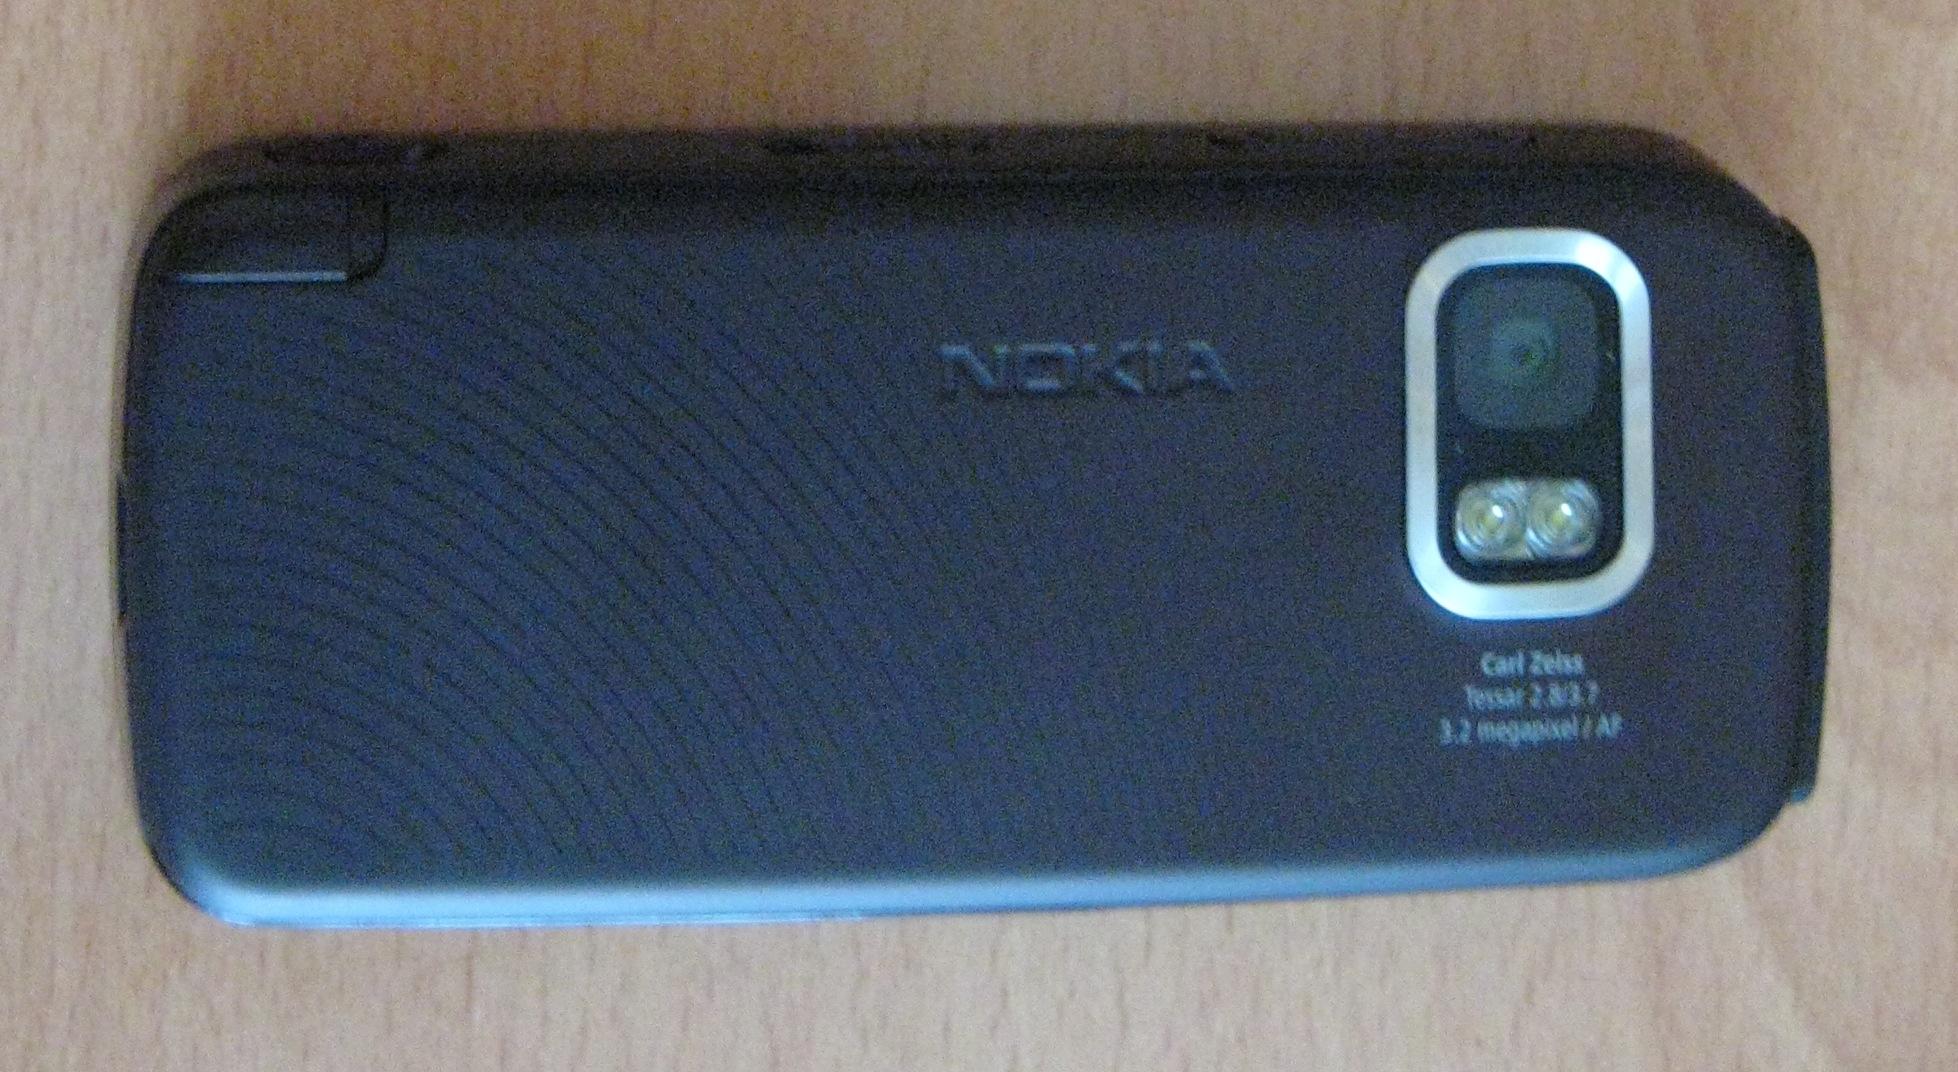 Pdf For Nokia 5800